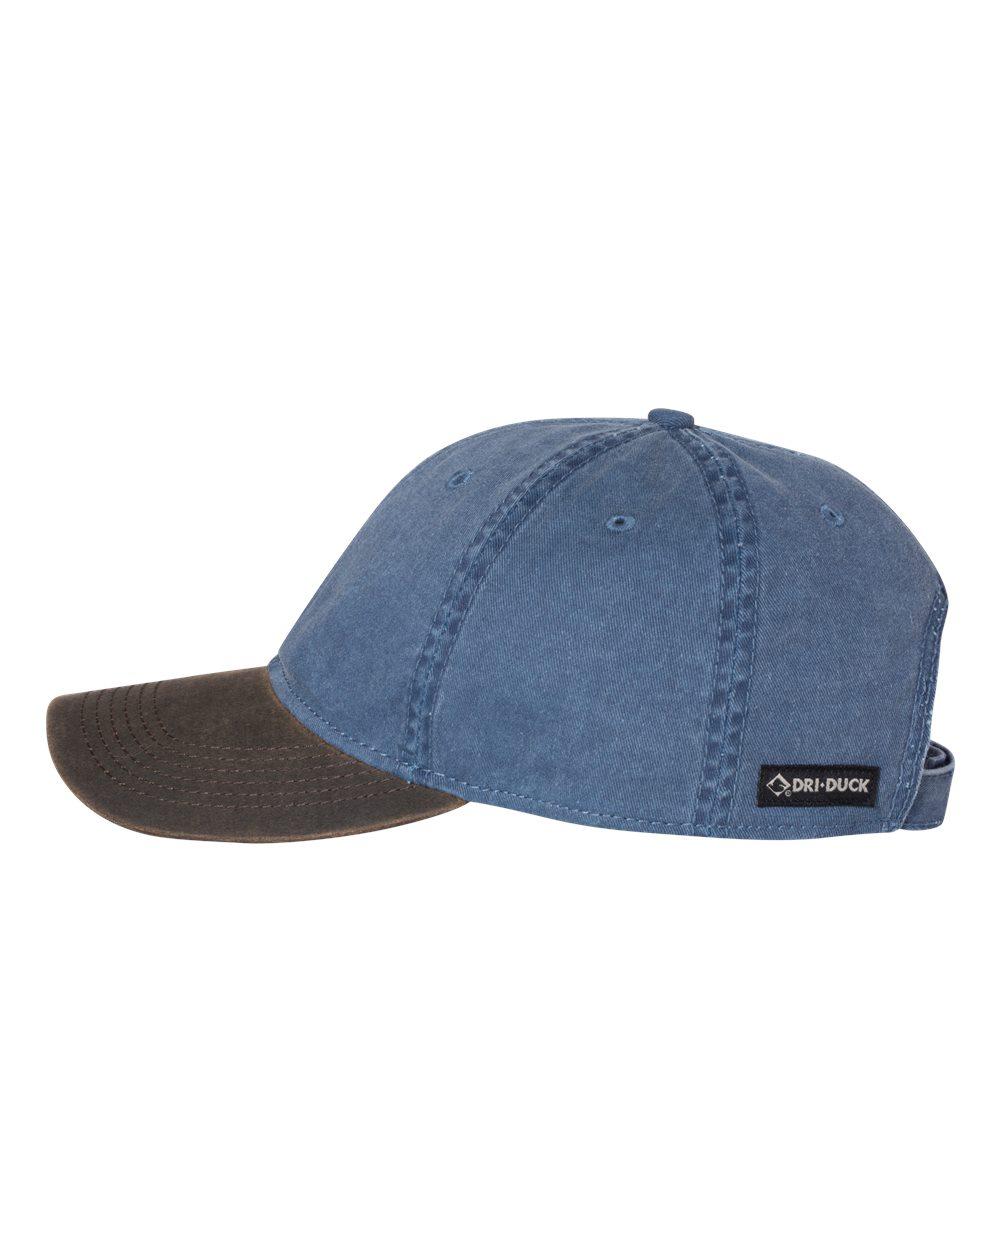 DRI DUCK 3333 - Vintage Cap